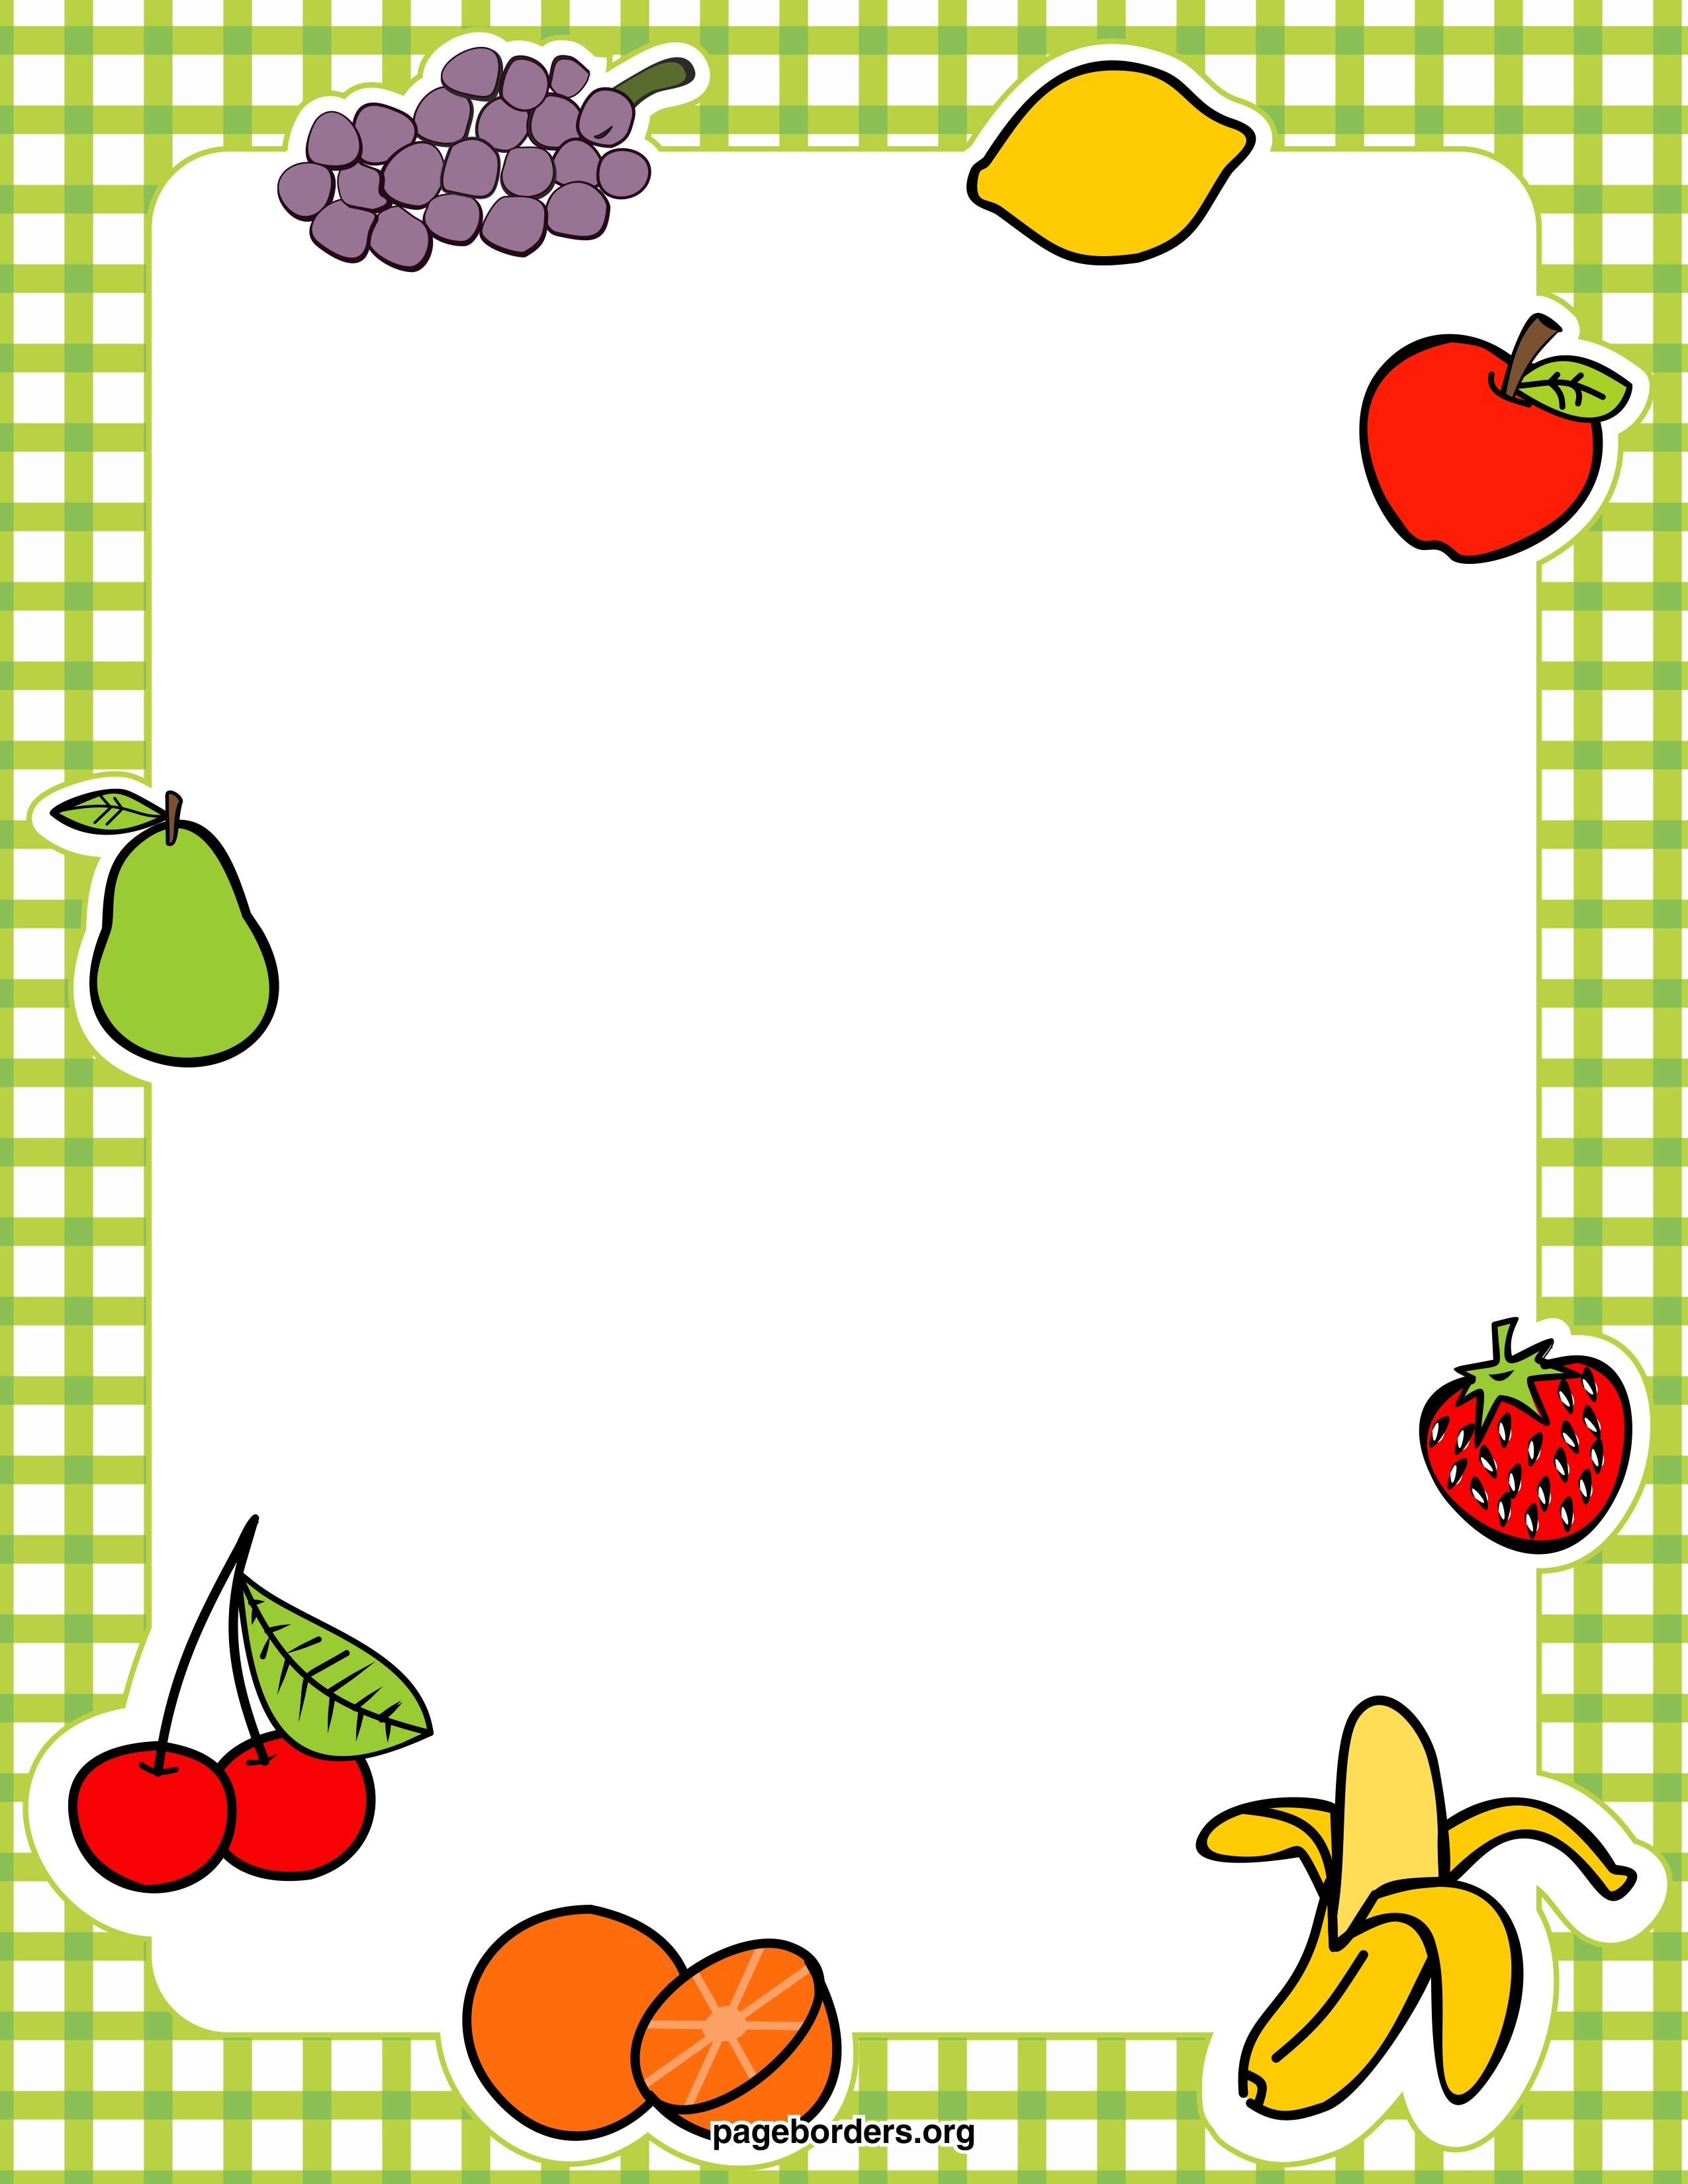 Free Food Border Cliparts, Download Free Clip Art, Free Clip.